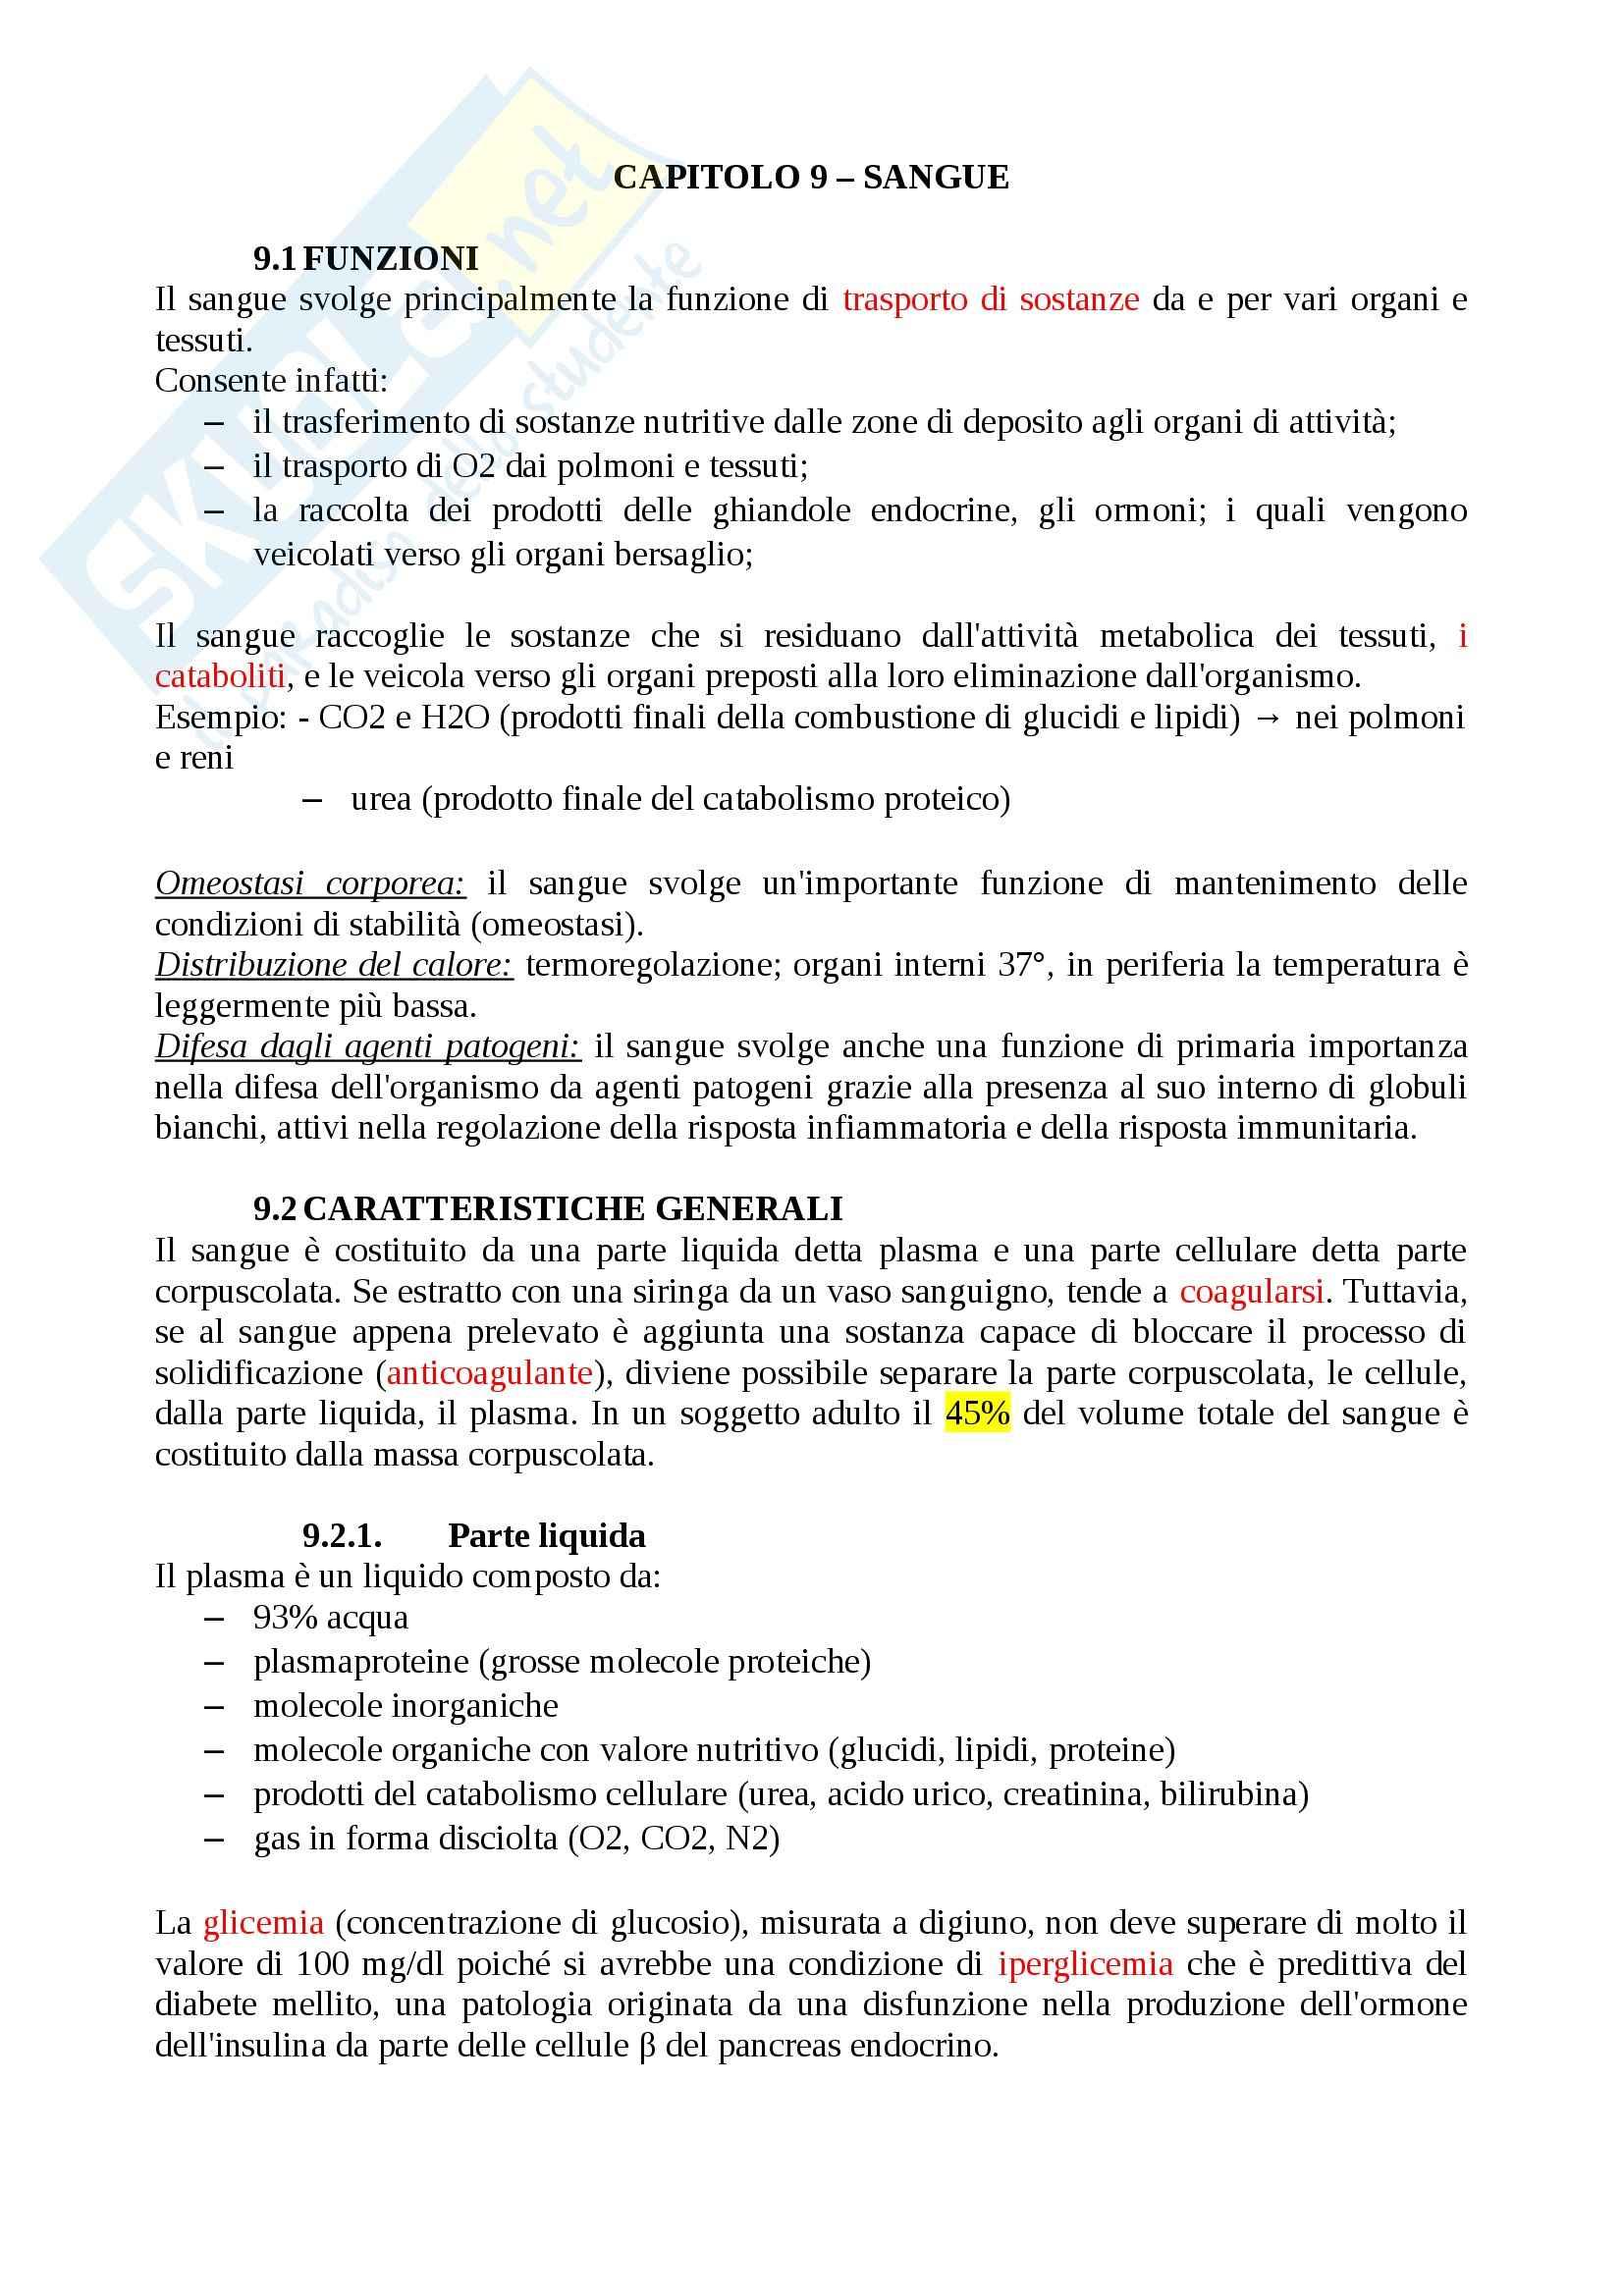 Riassunto esame Fisiologia Generale, prof. Veicsteinas, libro consigliato Fisiologia dell'Uomo - cap. 9